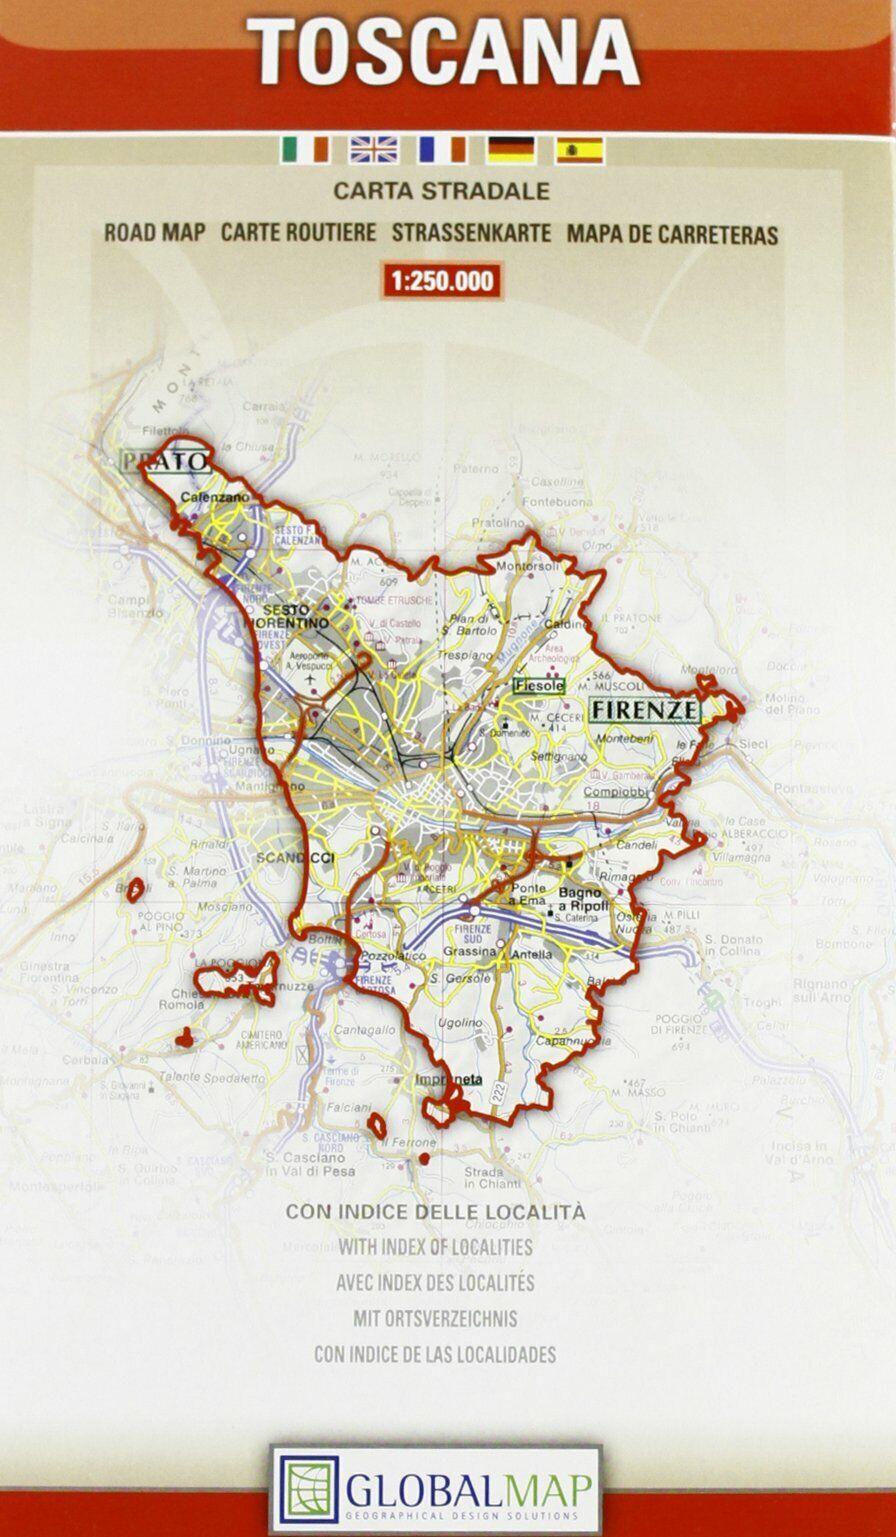 Cartina Giografica Toscana.Toscana Cartina Stradale Regionale Scala 1 250 000 Mappa Carta Global Map Ebay